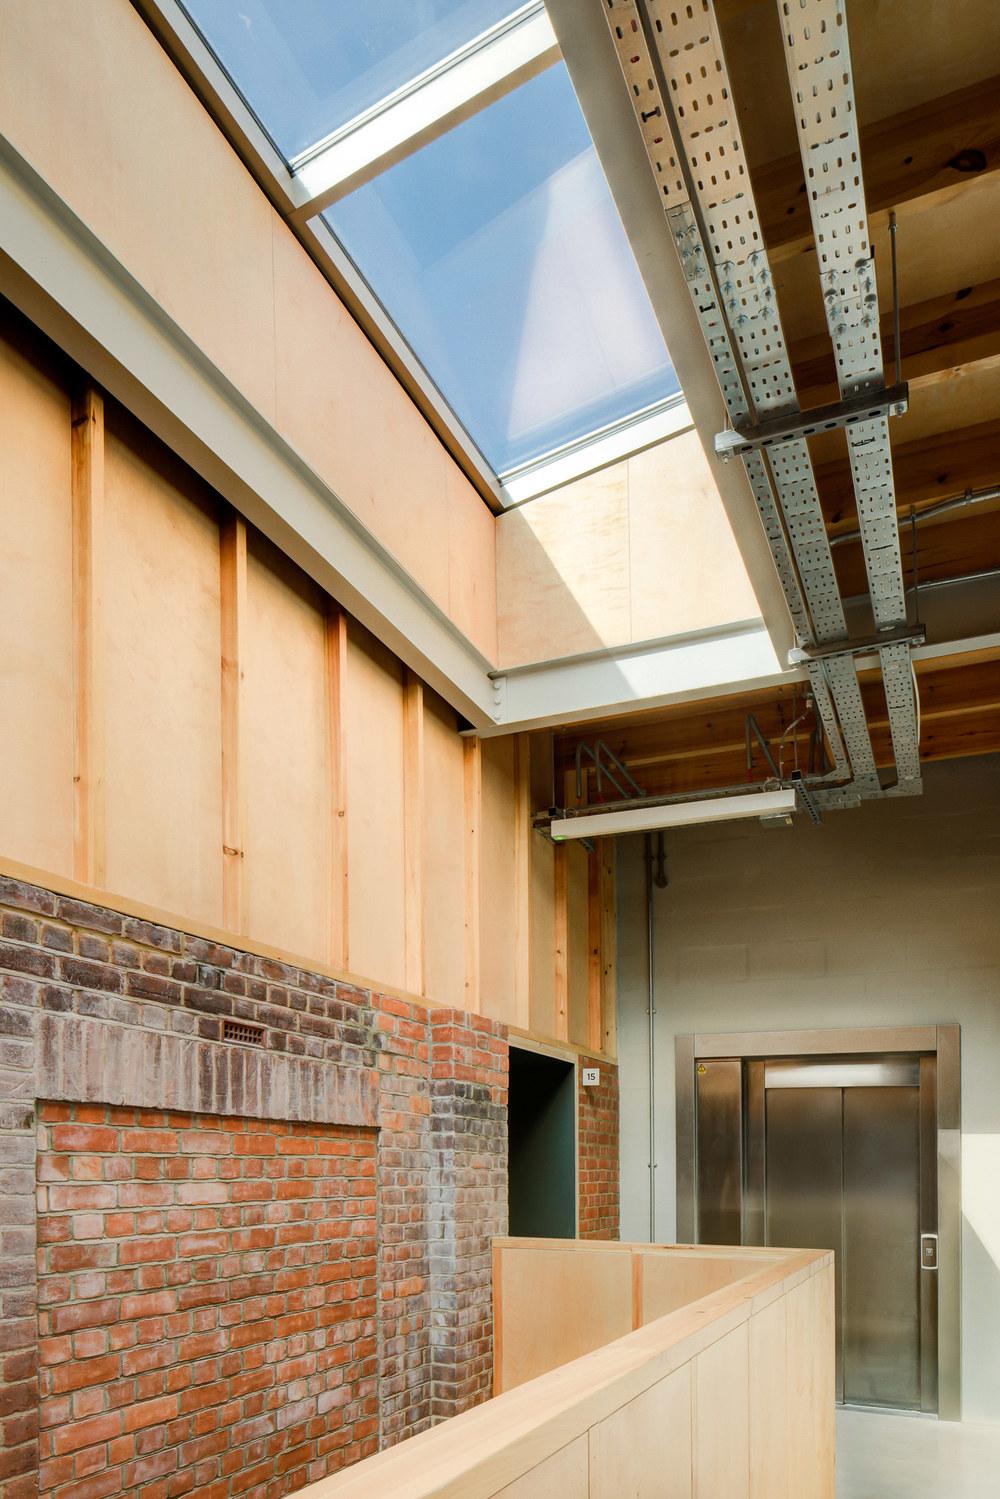 duggan-morris-RACC-mark-hadden-amsterdam-architecture-photographer-architectuurfotograaf-096.jpg